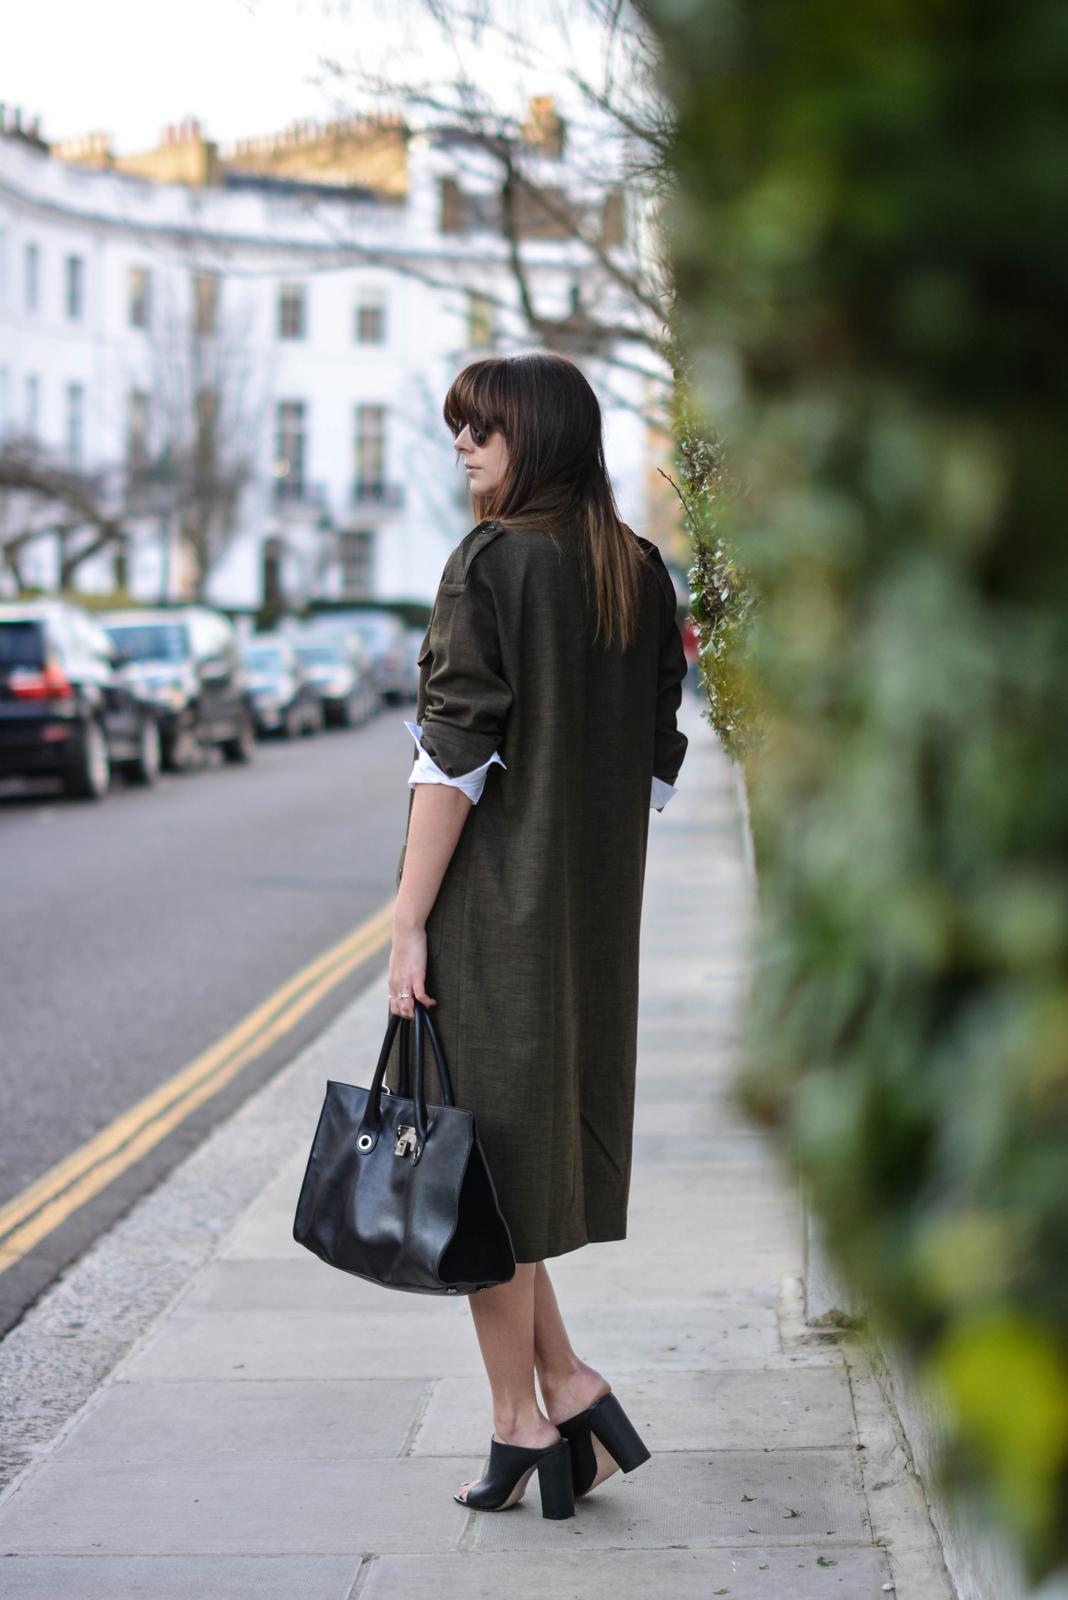 EJSTYLE - Emma Hill, London street style LFW, Khaki asos coord, asos khaki long jacket, Zara mules, Jimmy Choo Riley bag